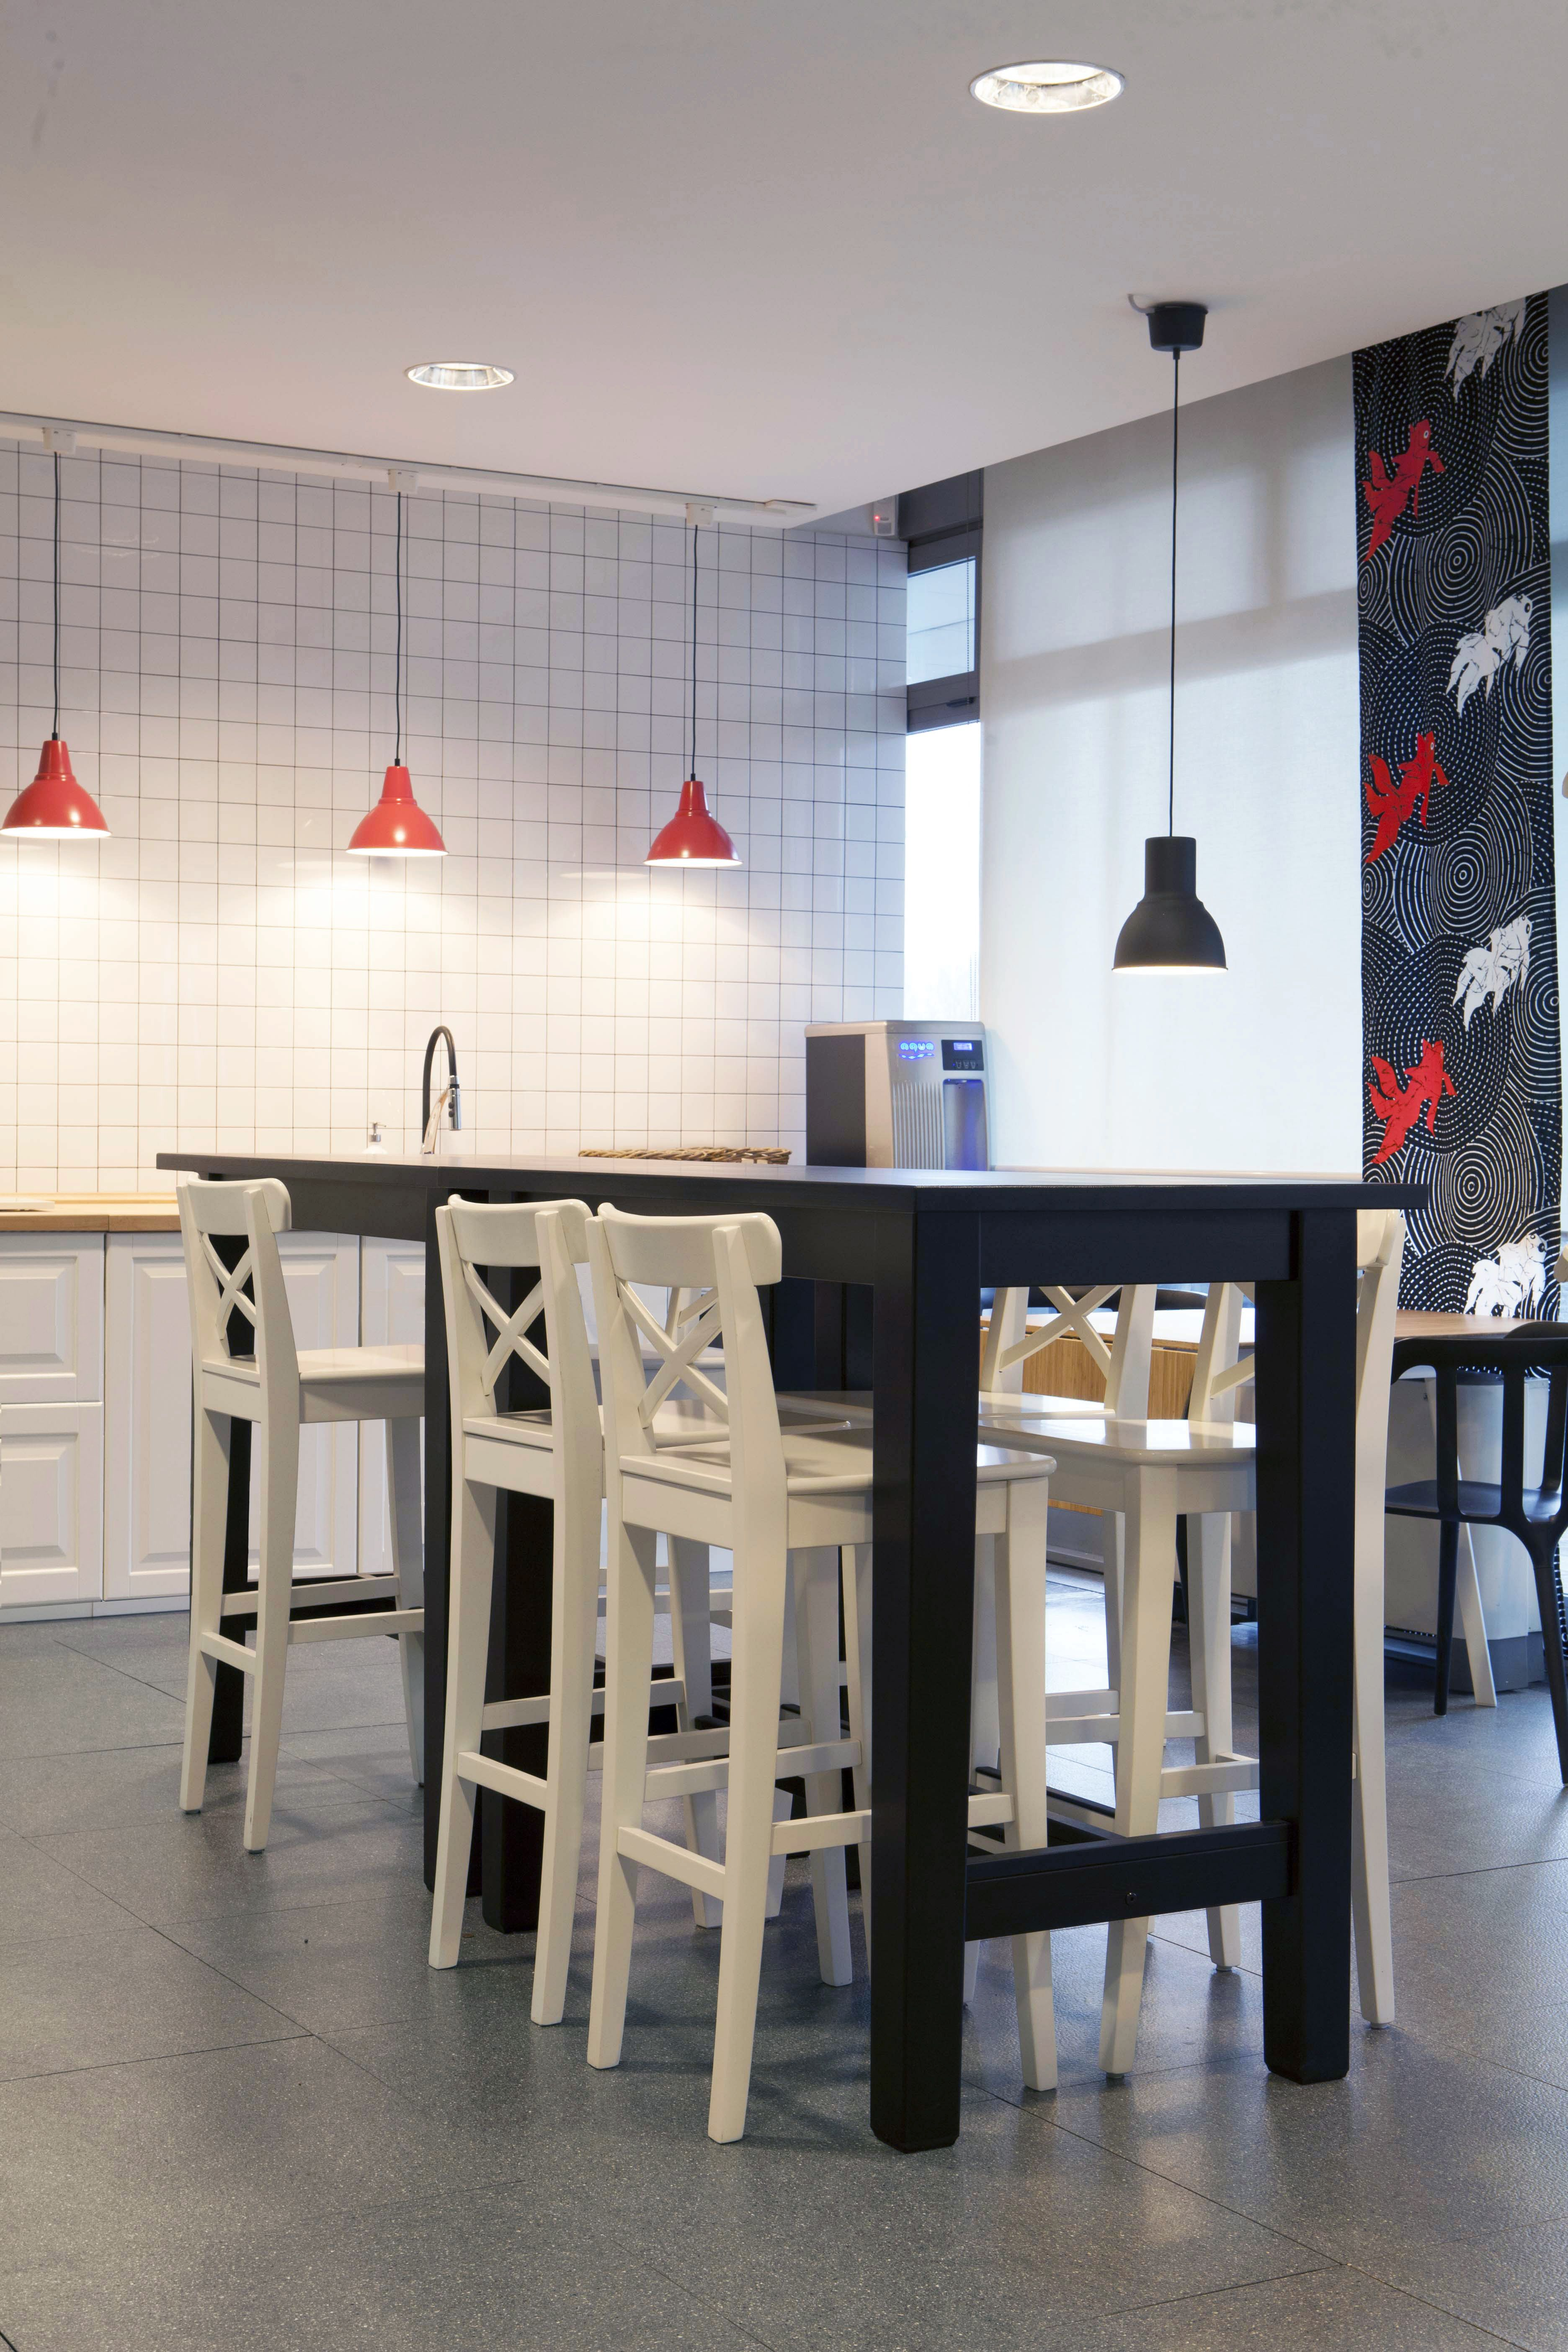 bfd4ae94bf5b9cc8051daf8f3d627168 Frais De Bar De Salon Ikea Concept